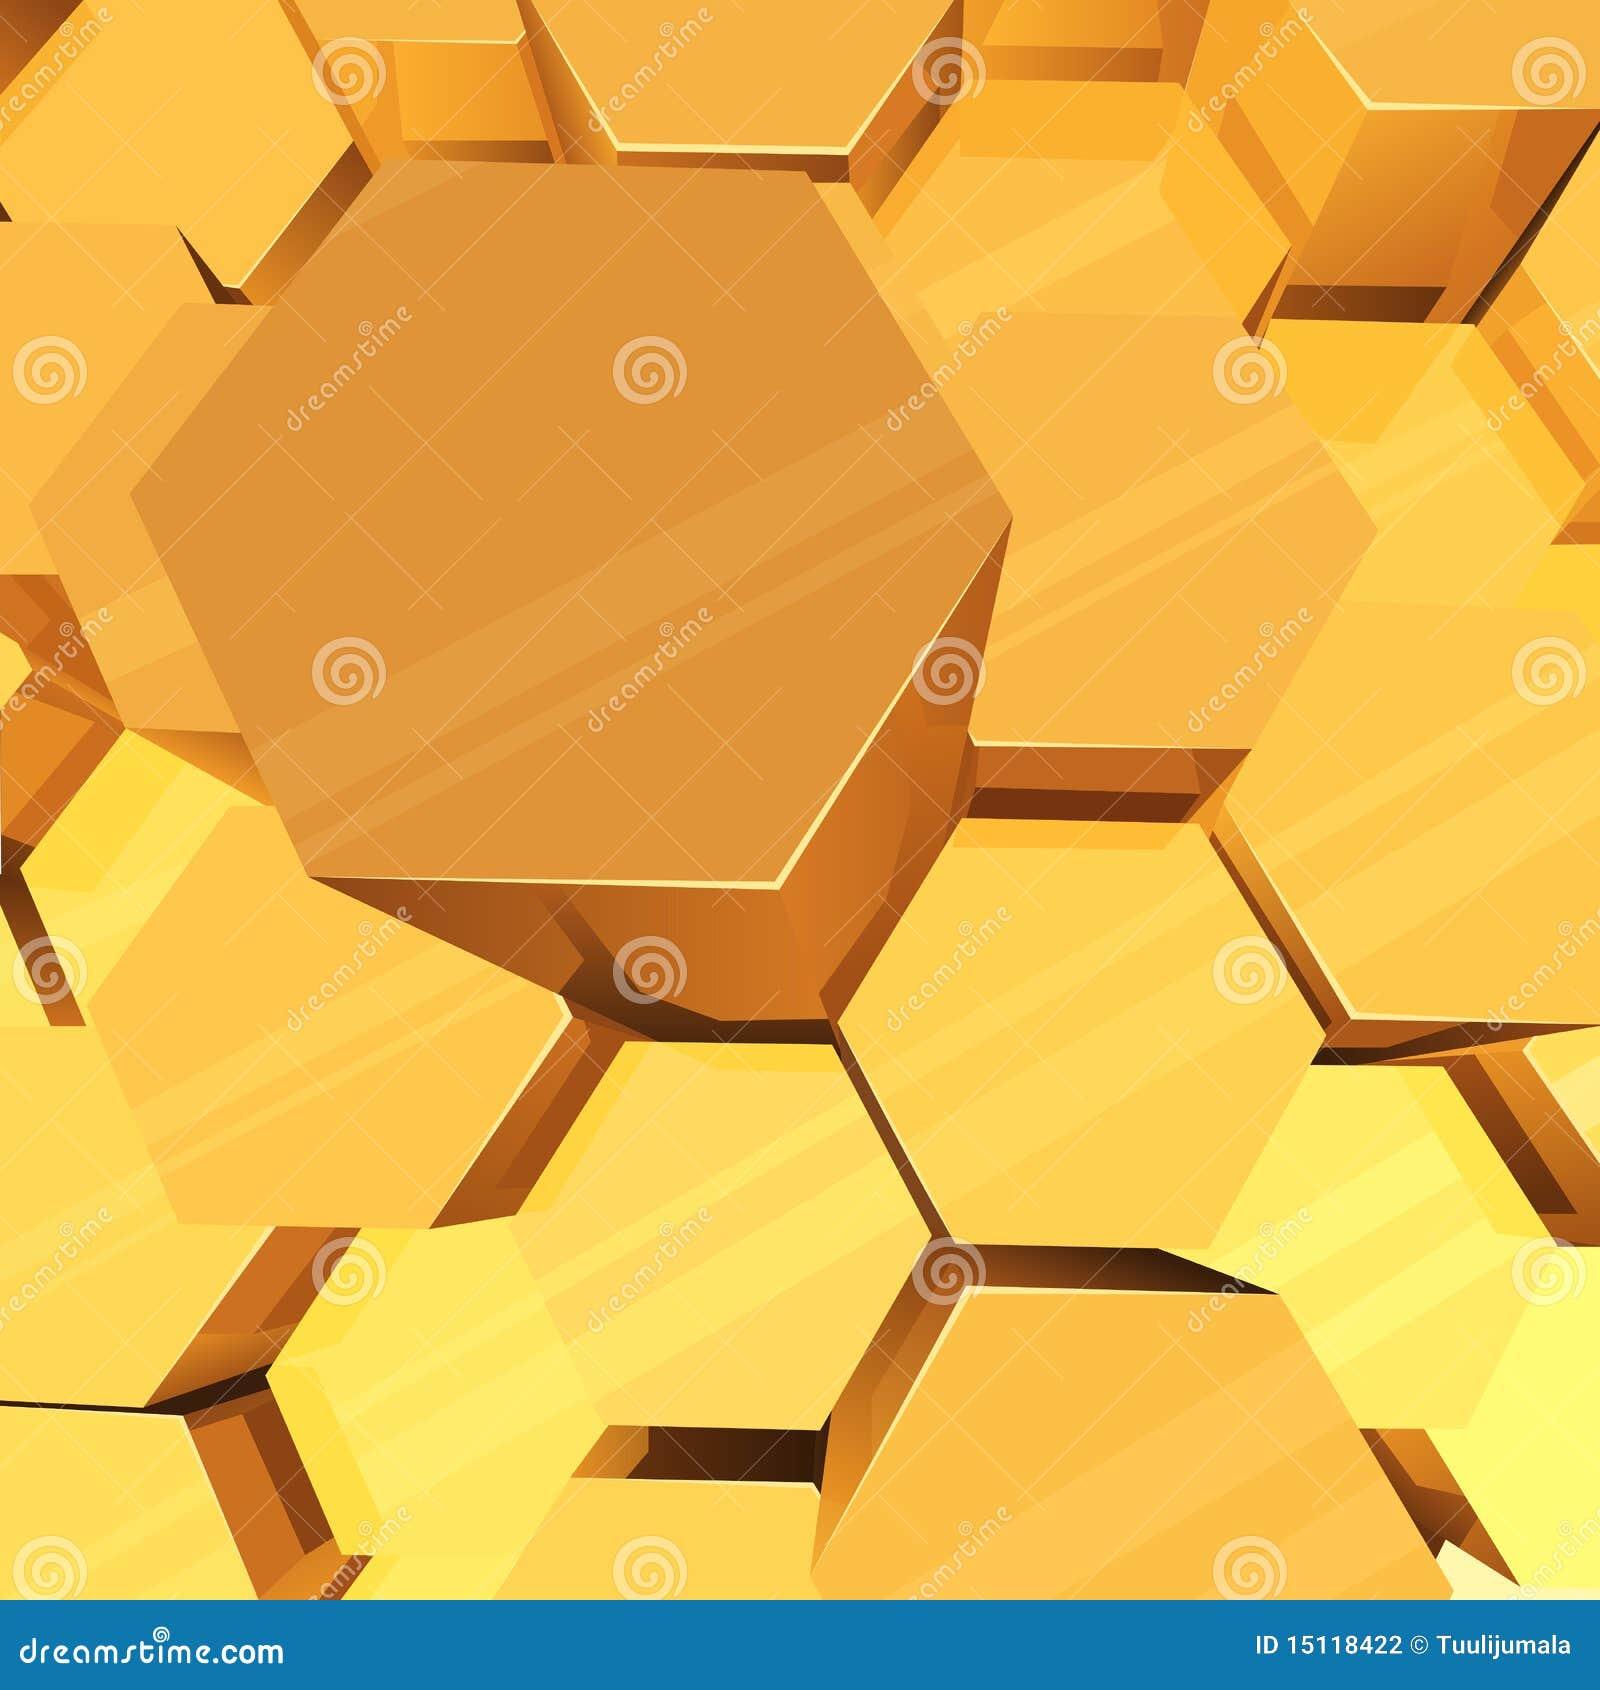 3D hexagons background